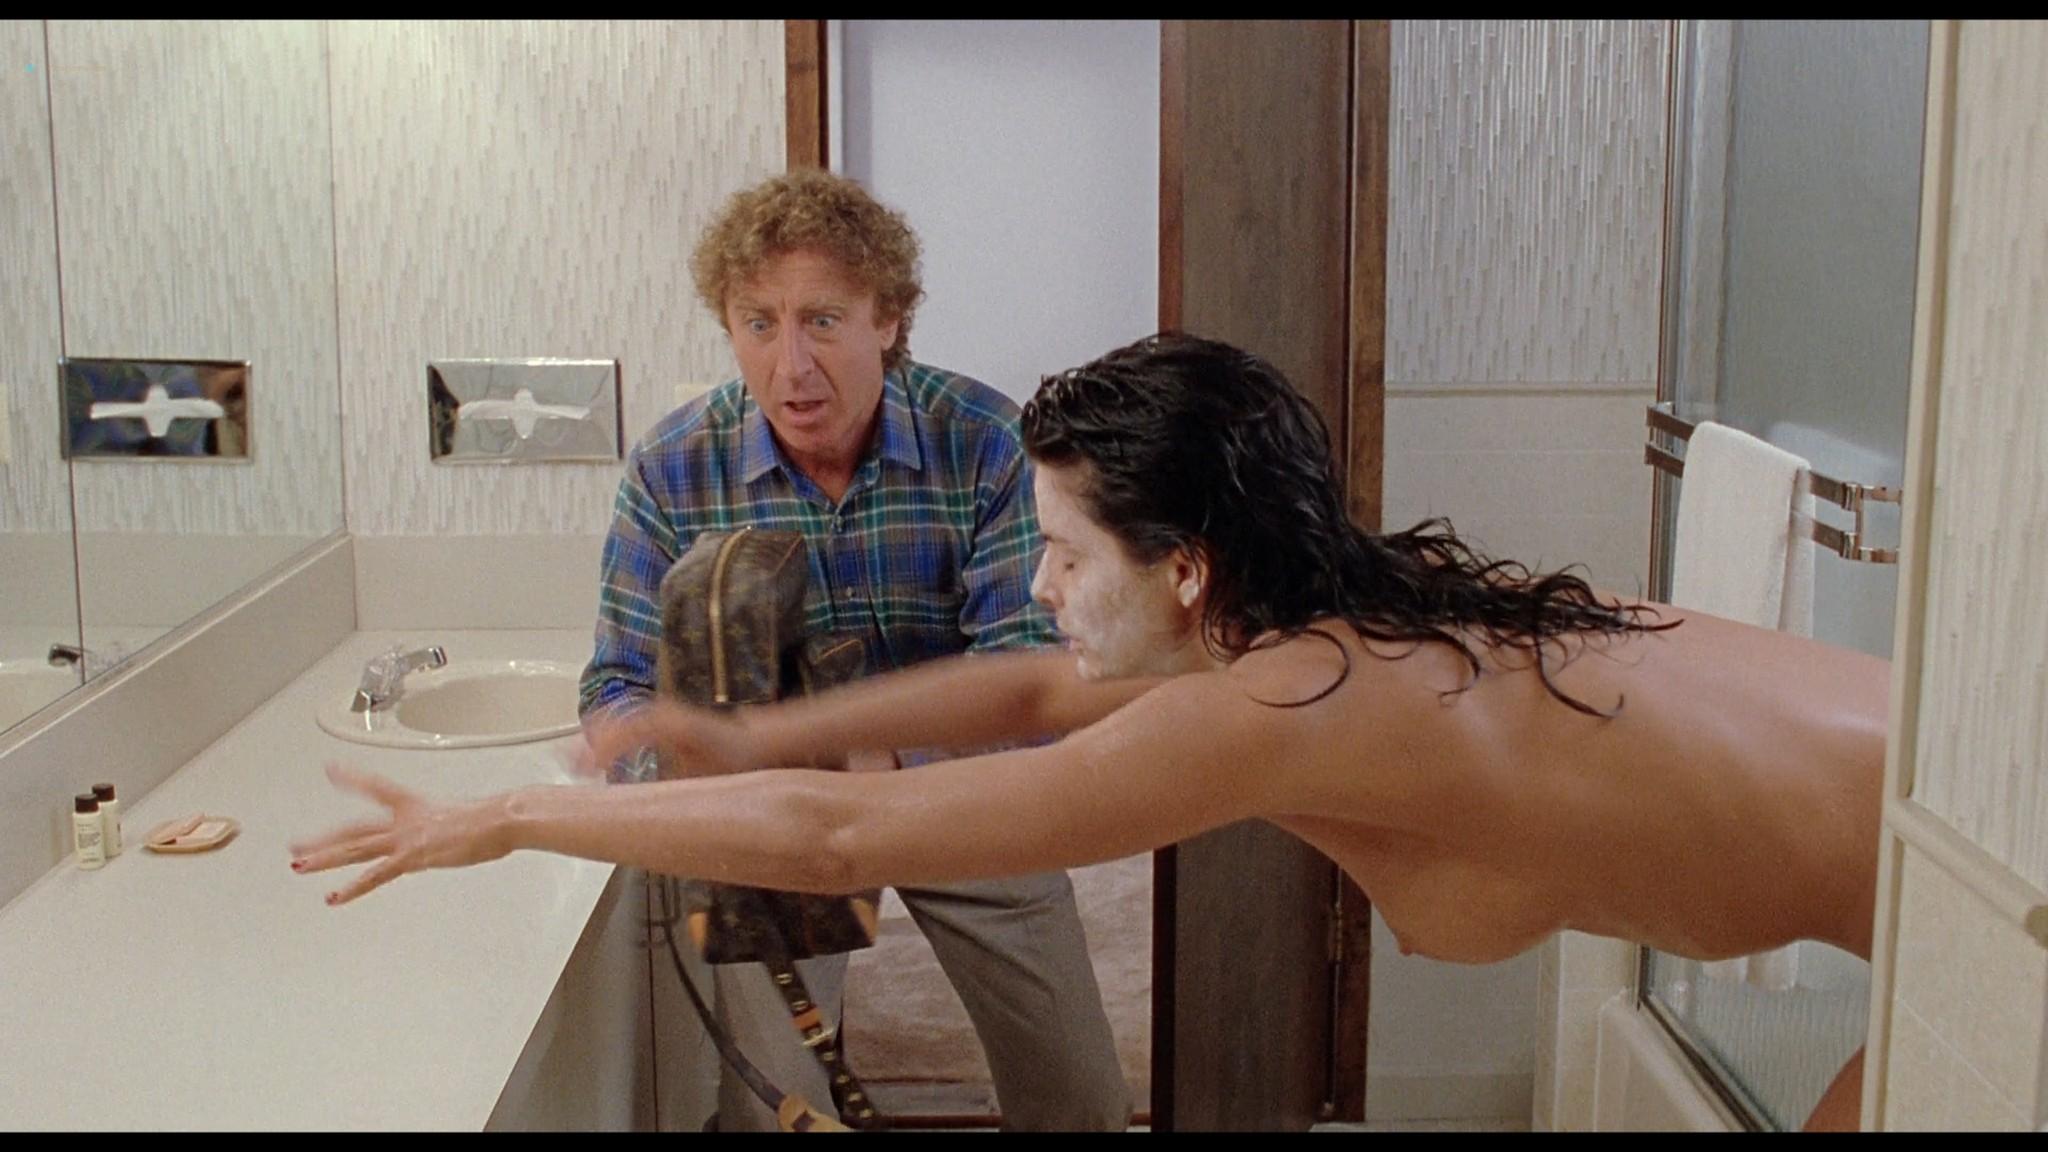 Joan Severance nude topless - See No Evil Hear No Evil (1989) HD 720/1080p (8)